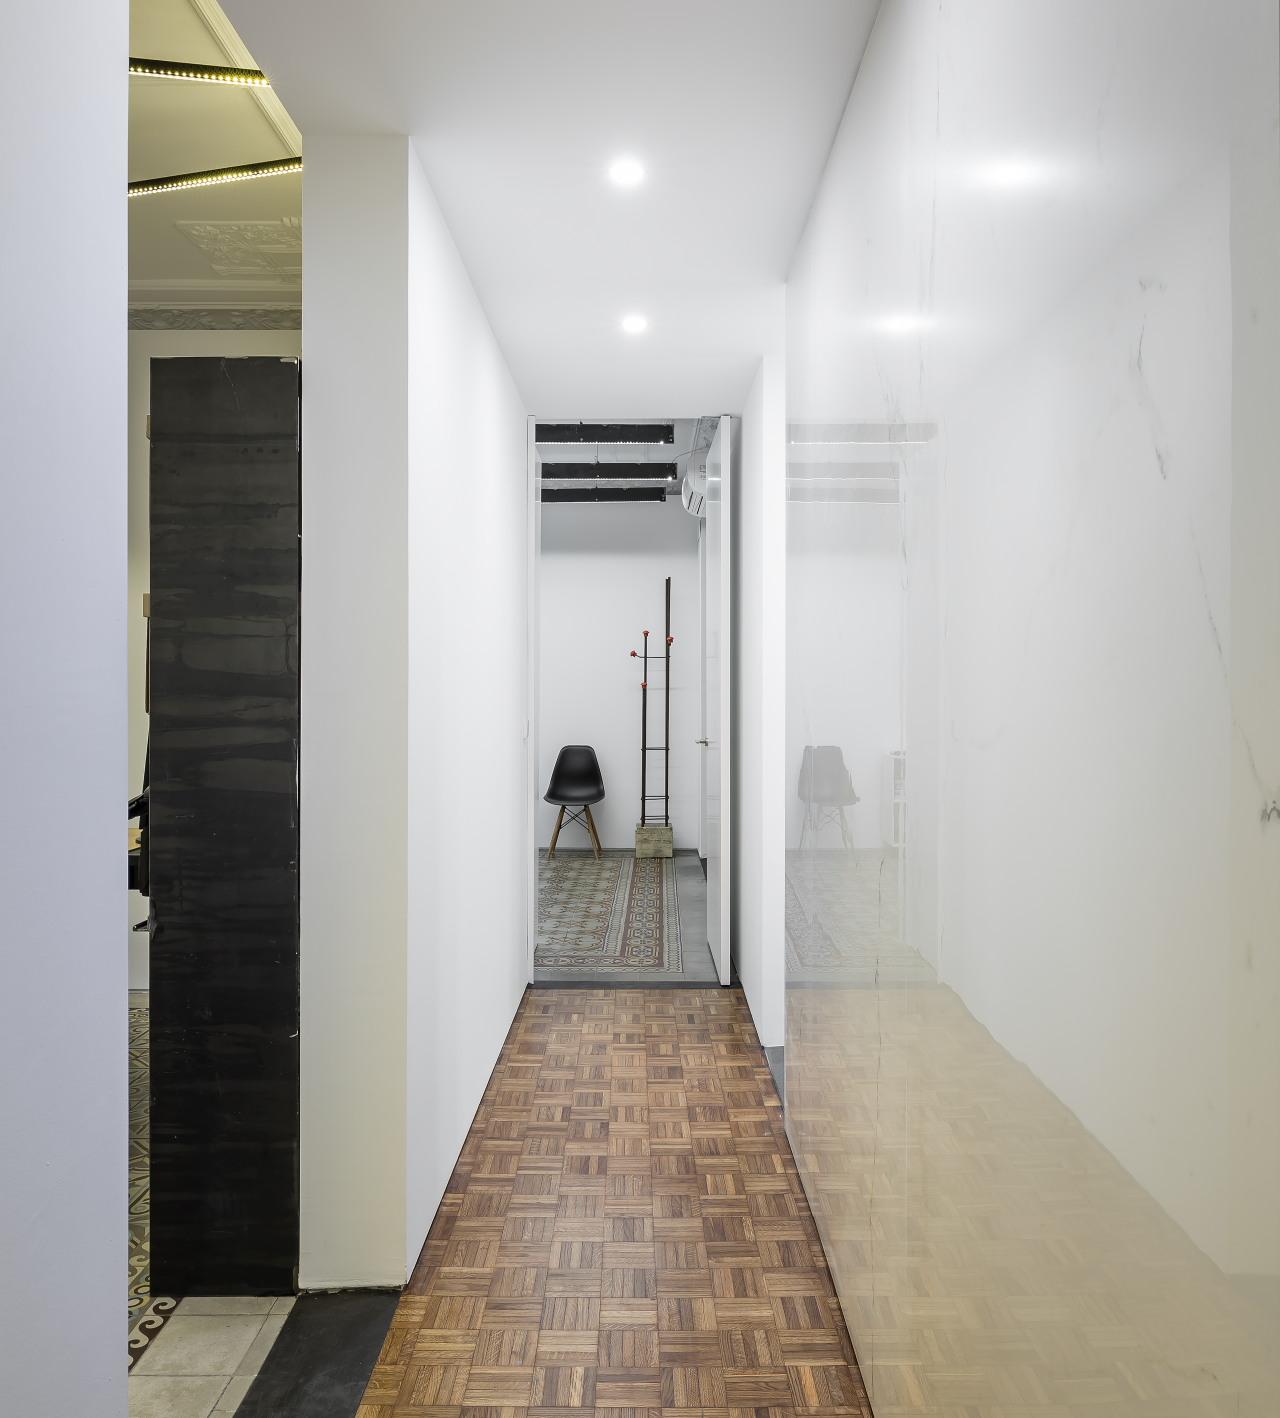 fotografia-arquitectura-interiorismo-valencia-german-cabo-viraje-estudio-pujol (13)